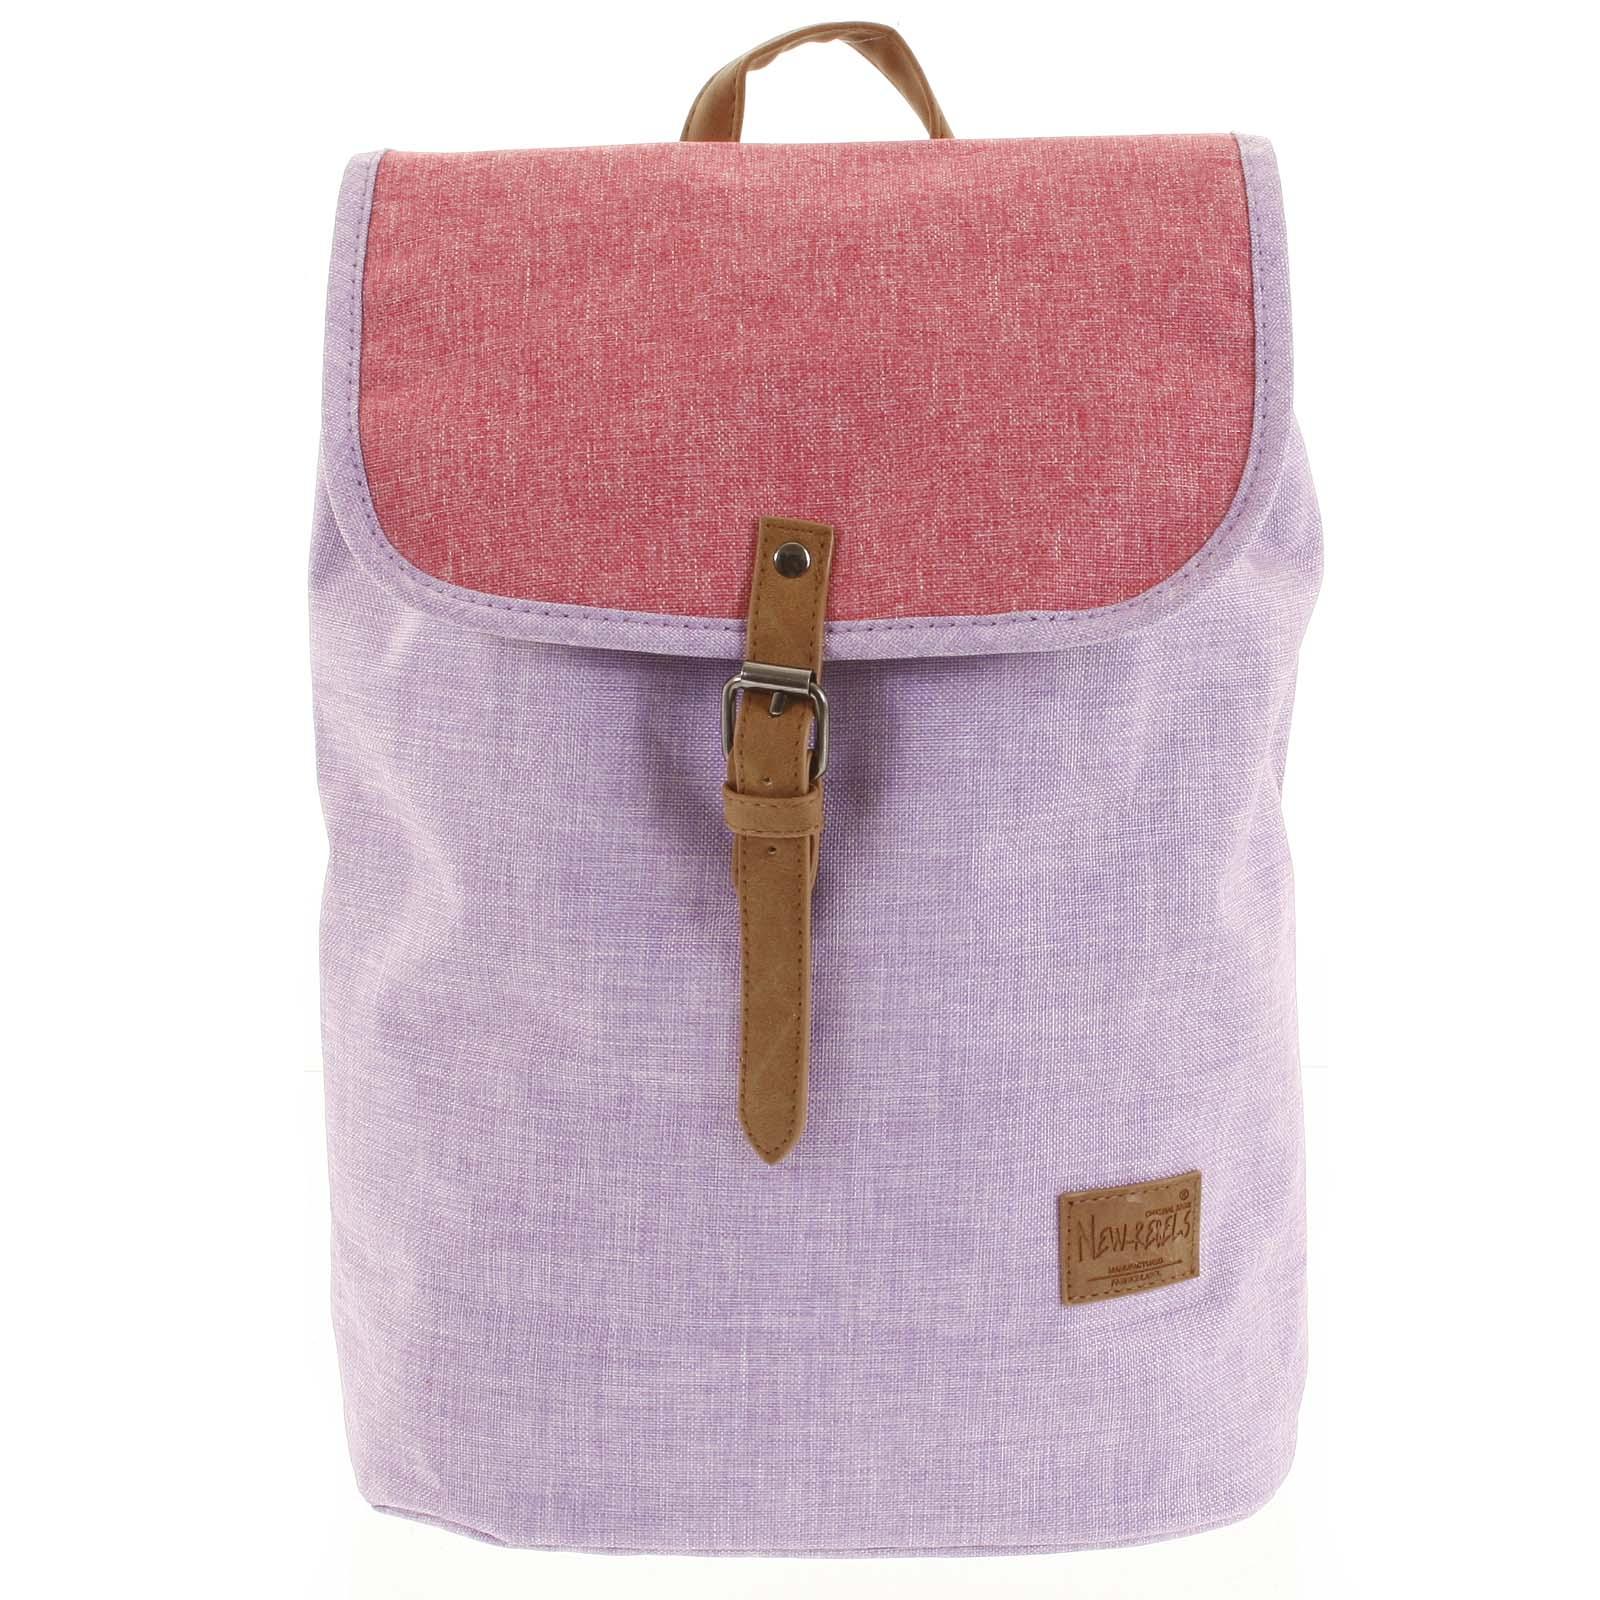 Elegantní látkový fialovo růžový batoh - New Rebels Morpheus